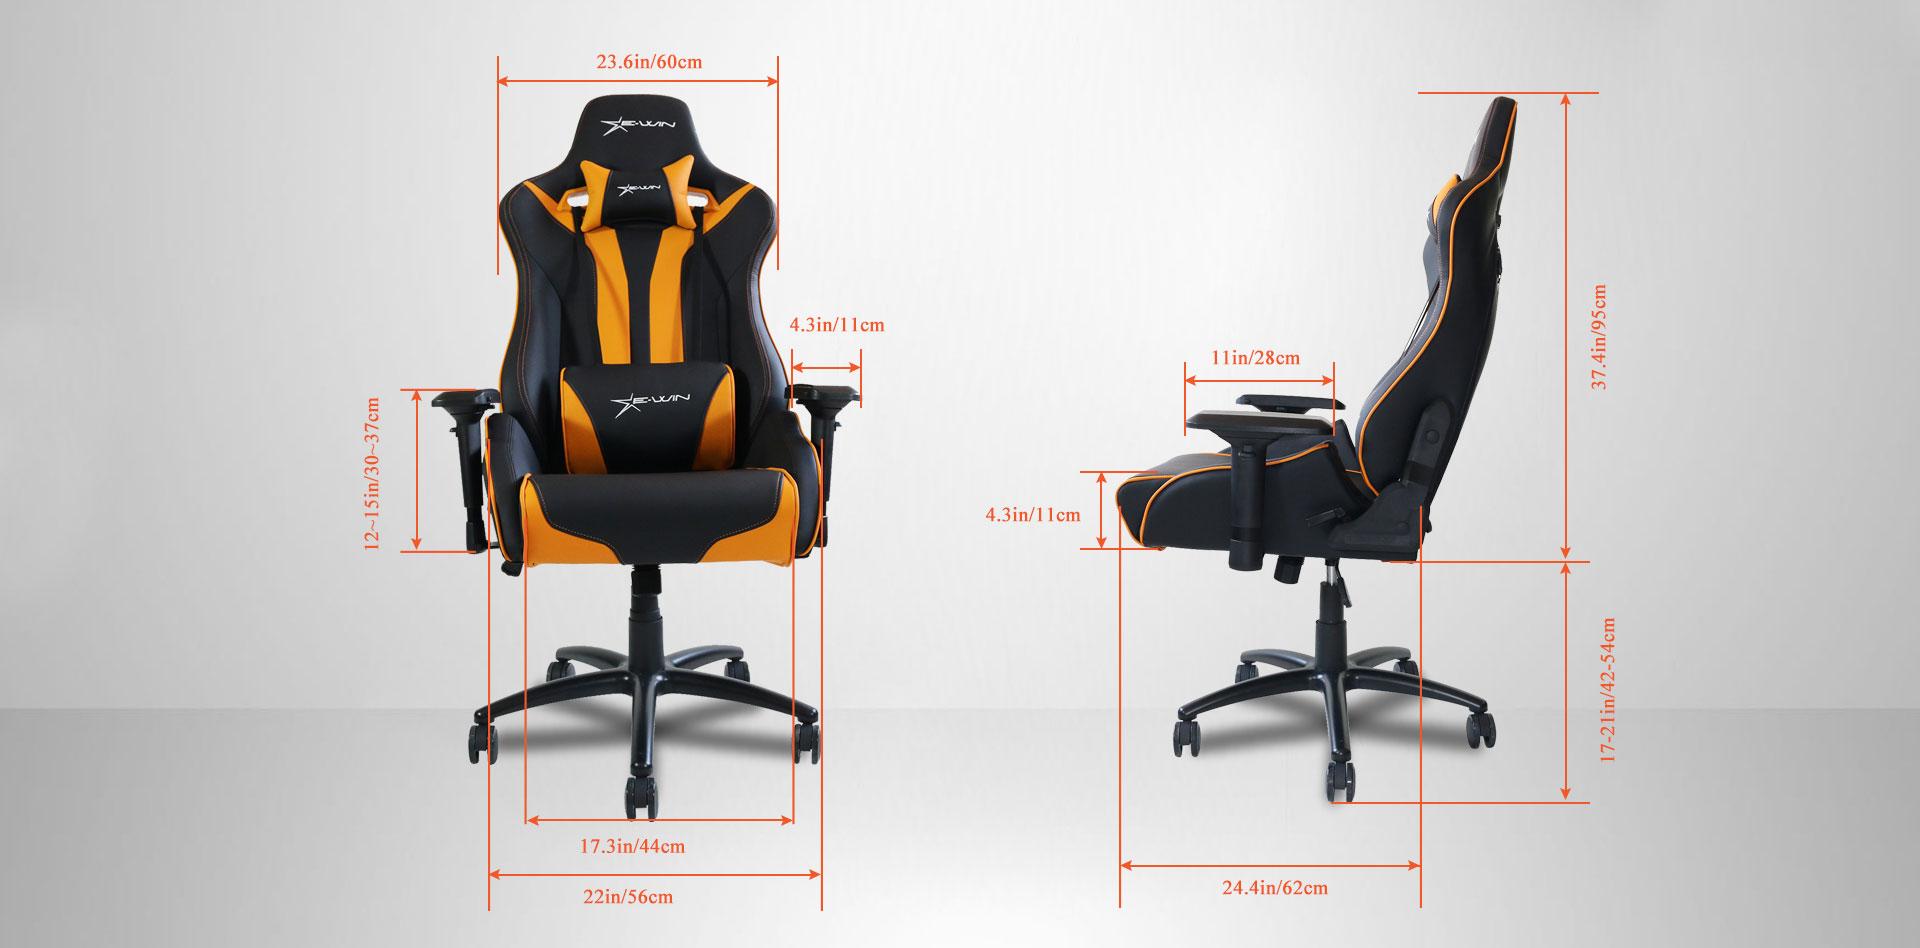 EwinRacing Flash XL Gaming Chairs Dimensions